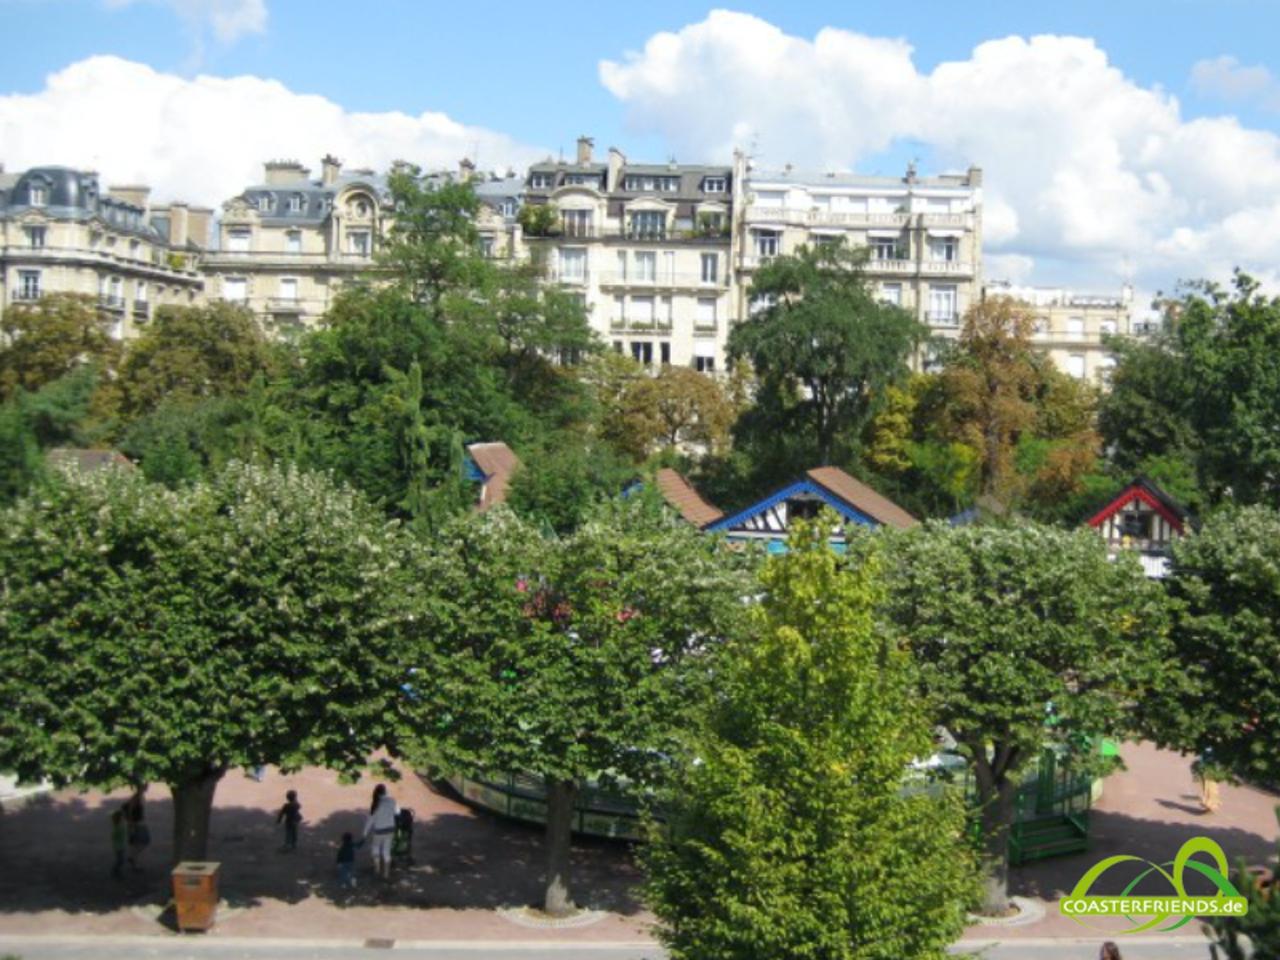 Jardin d'Acclimatation Impressionen